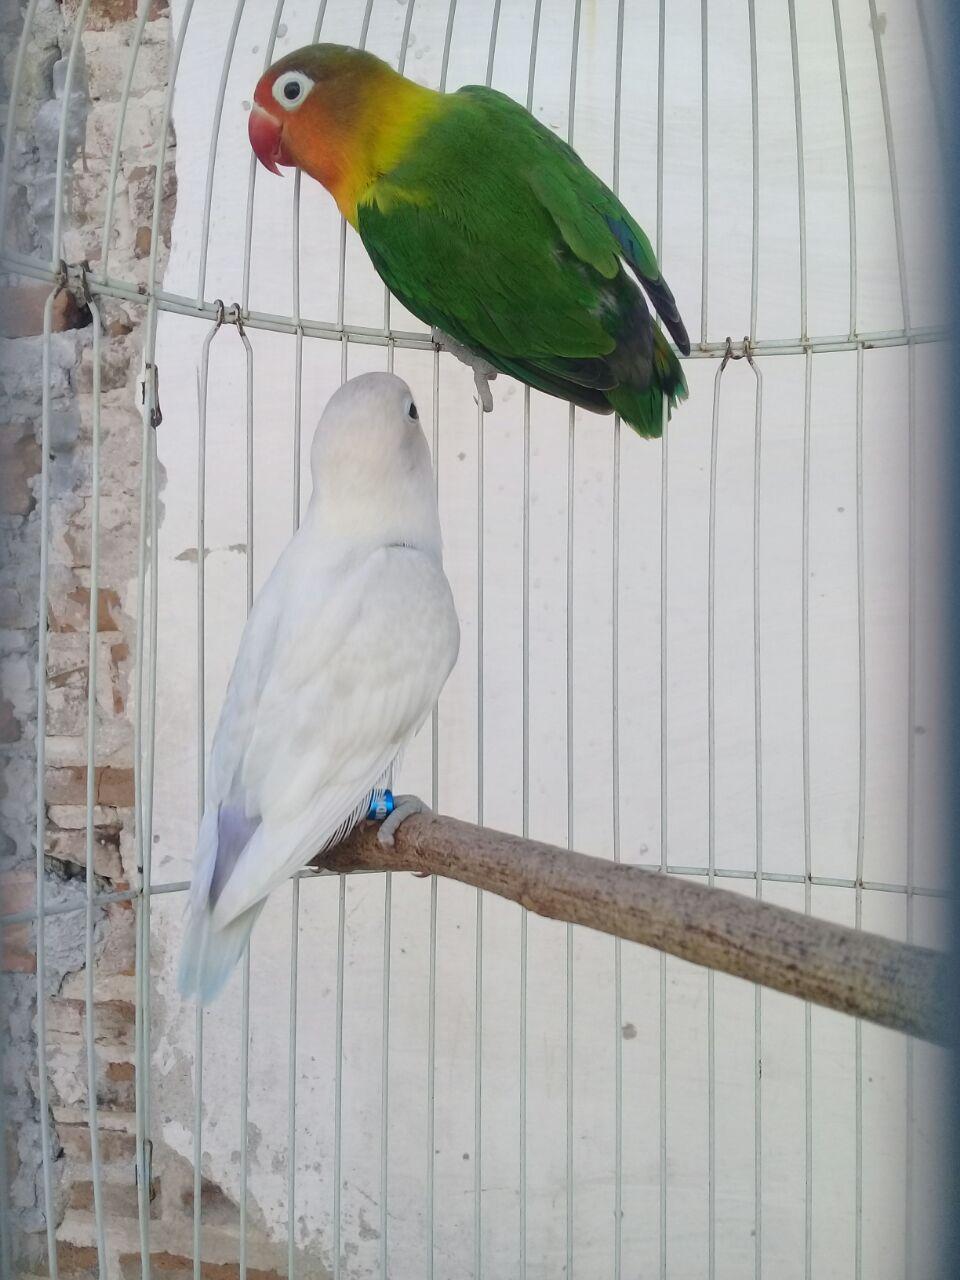 Sejarah Love Bird (Burung Cinta), Burung Paling Populer di Indonesia